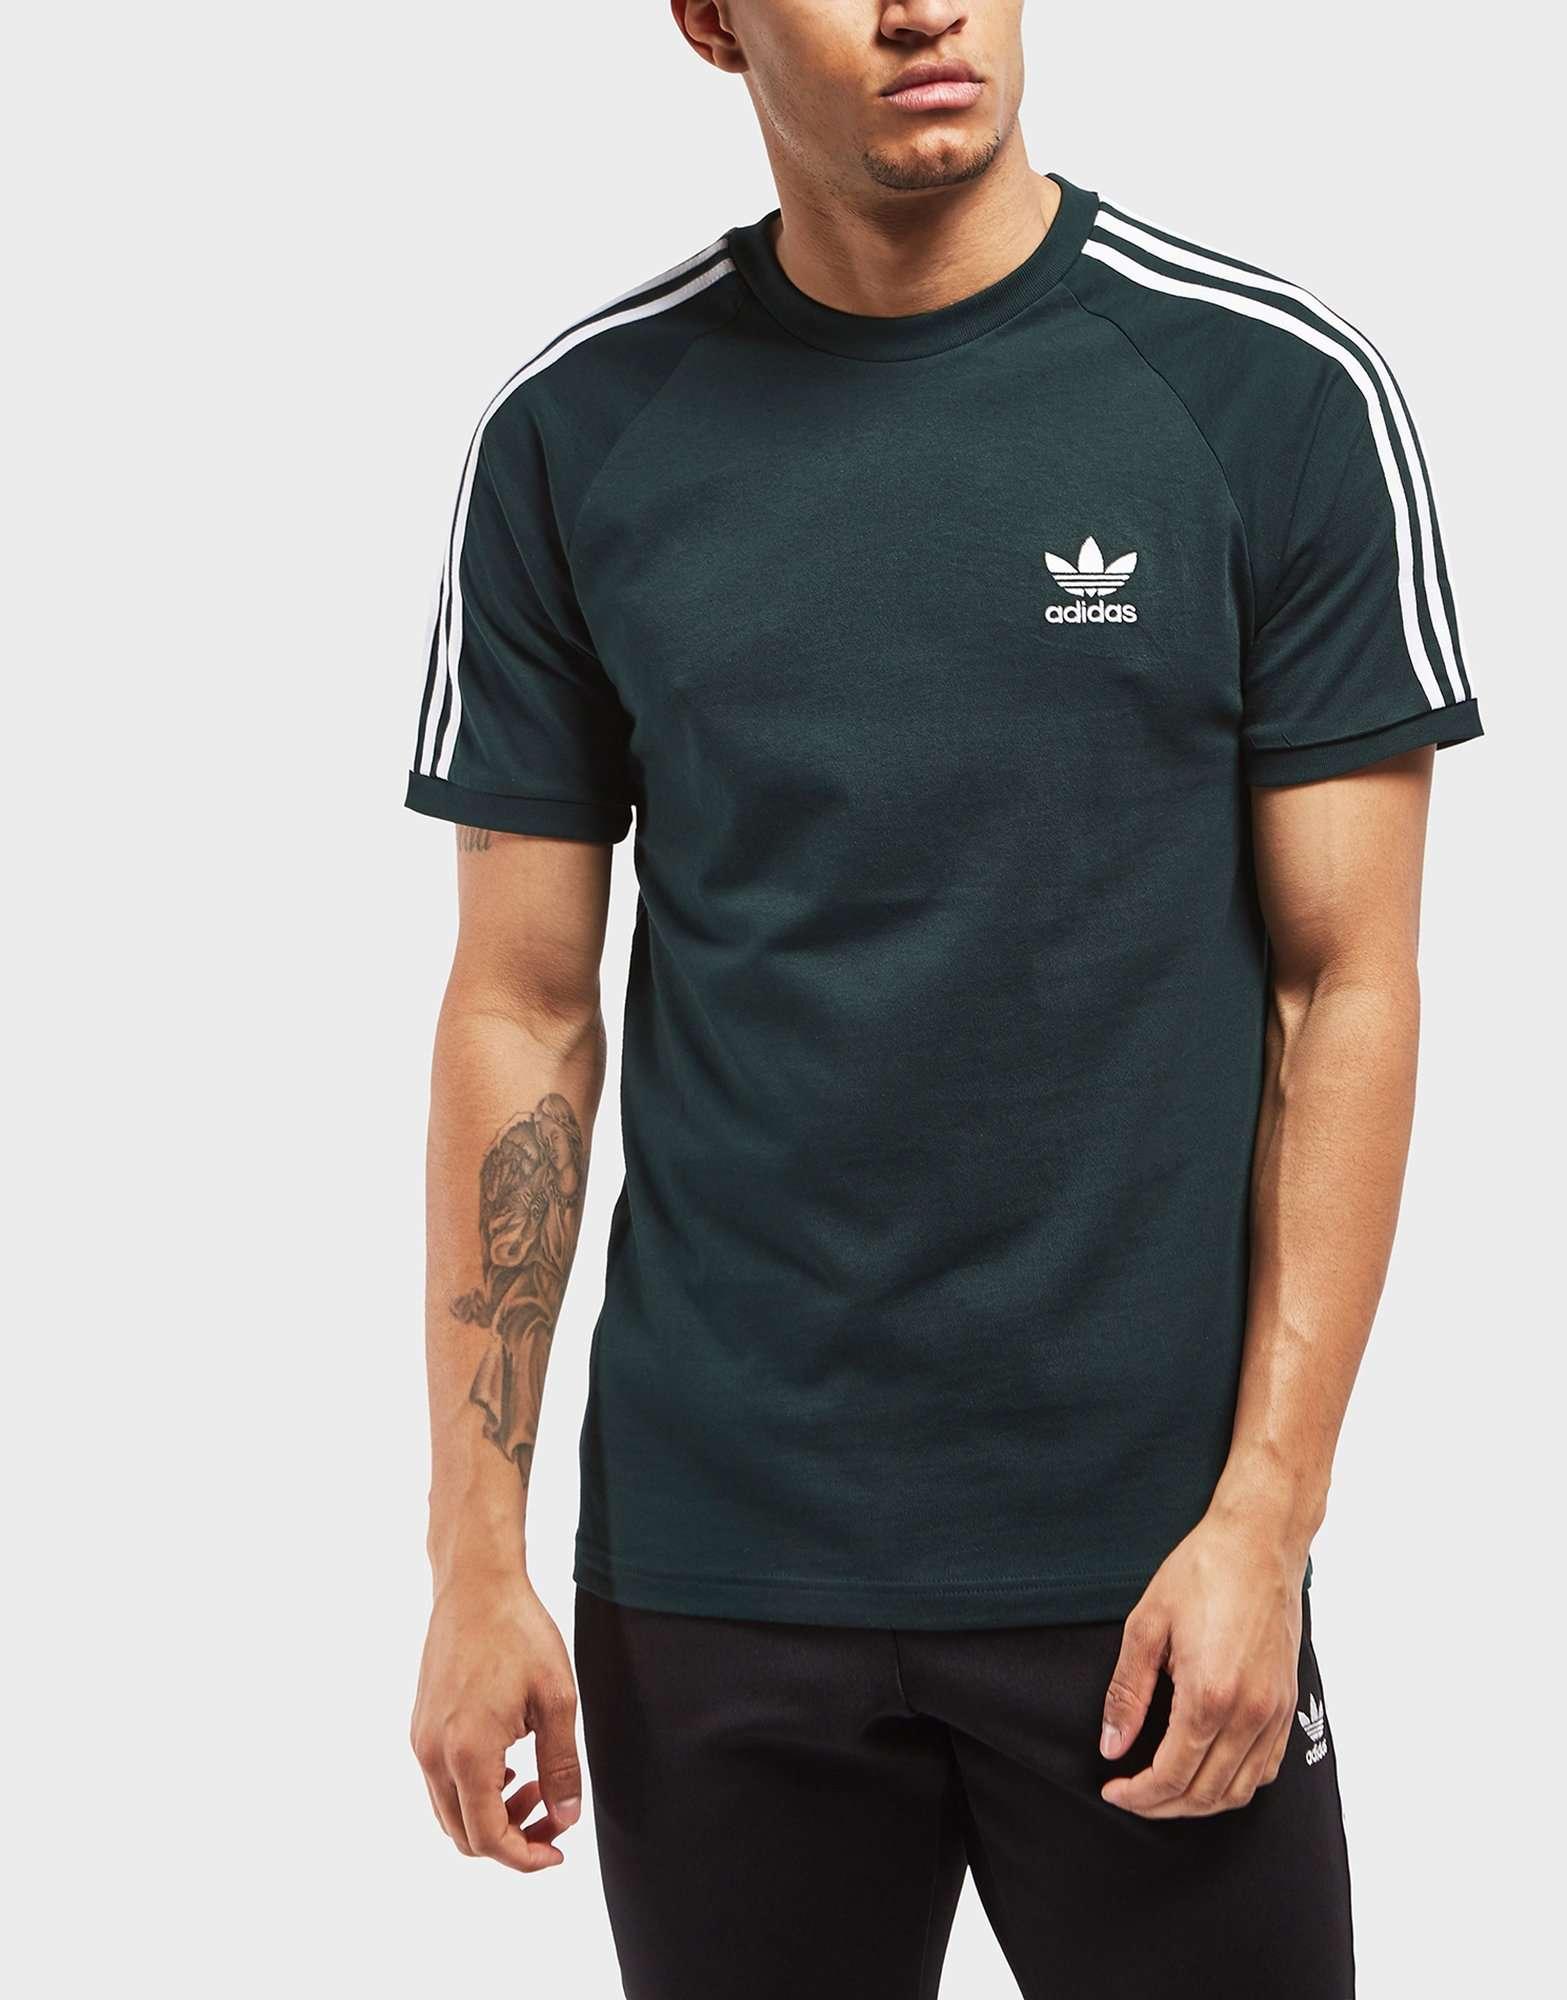 adidas Originals 3-Stripes Short Sleeve T-Shirt